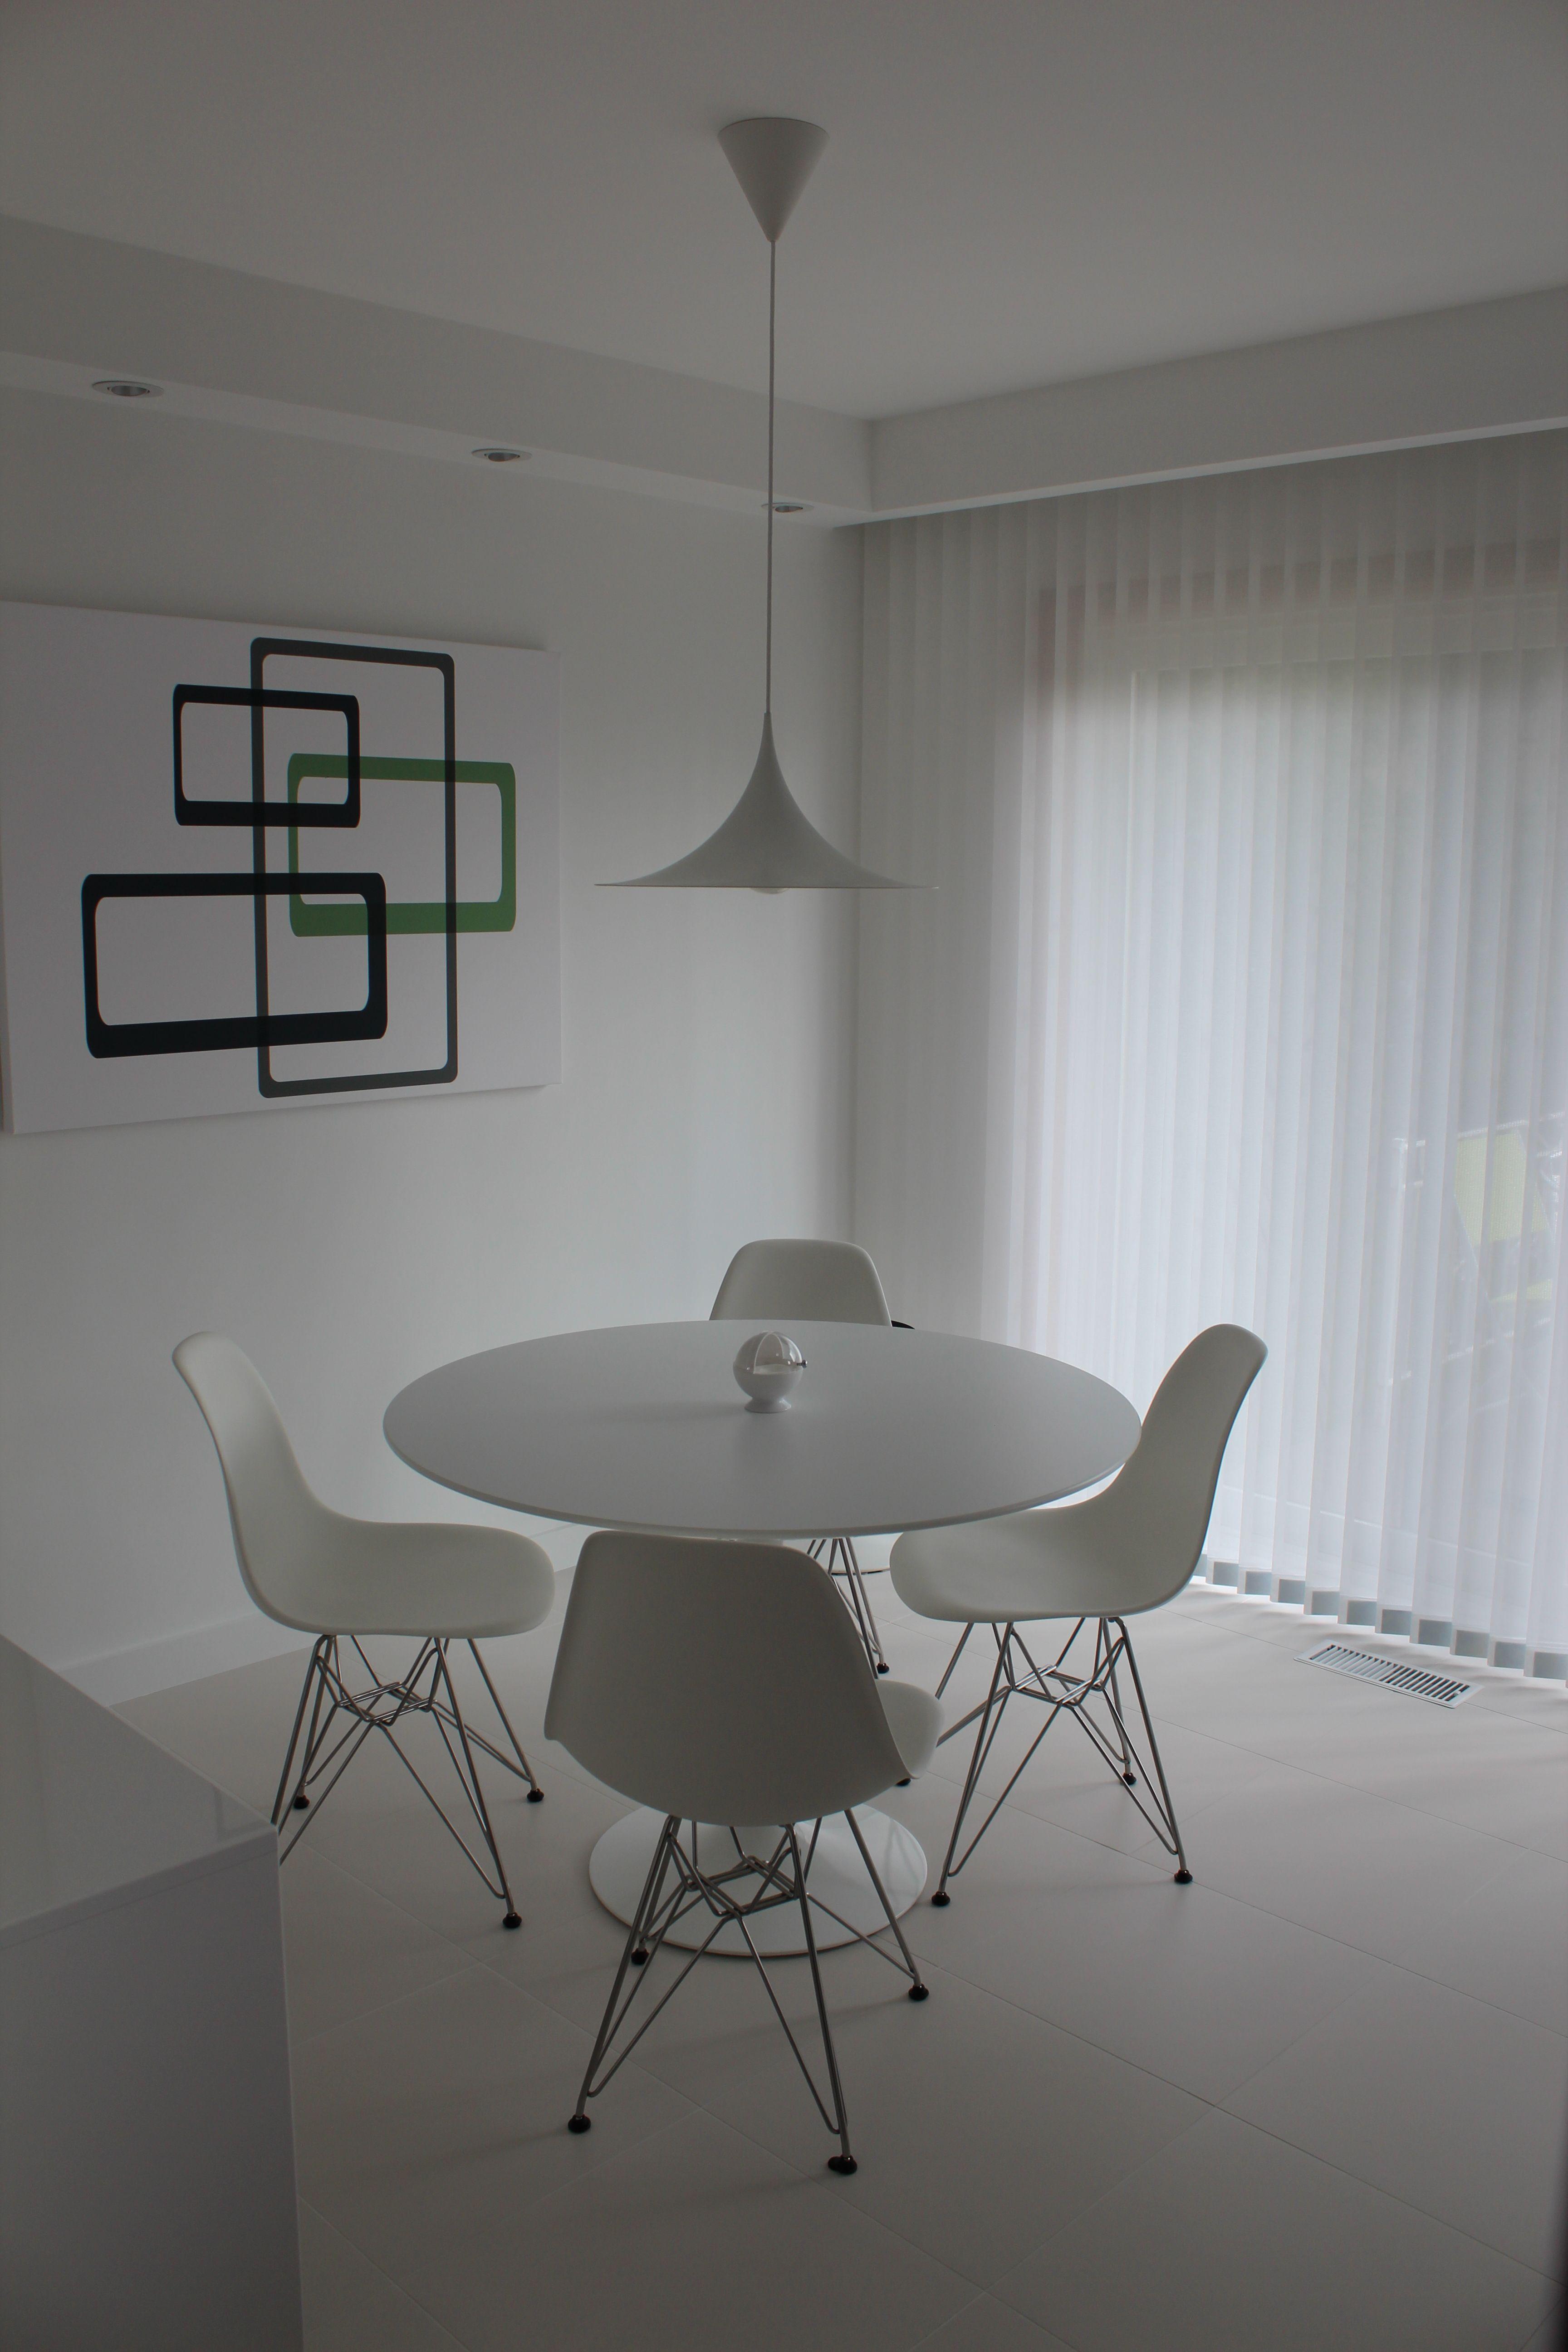 Herman Miller Eames DSR and Knoll 42 Saarinen Tulip table